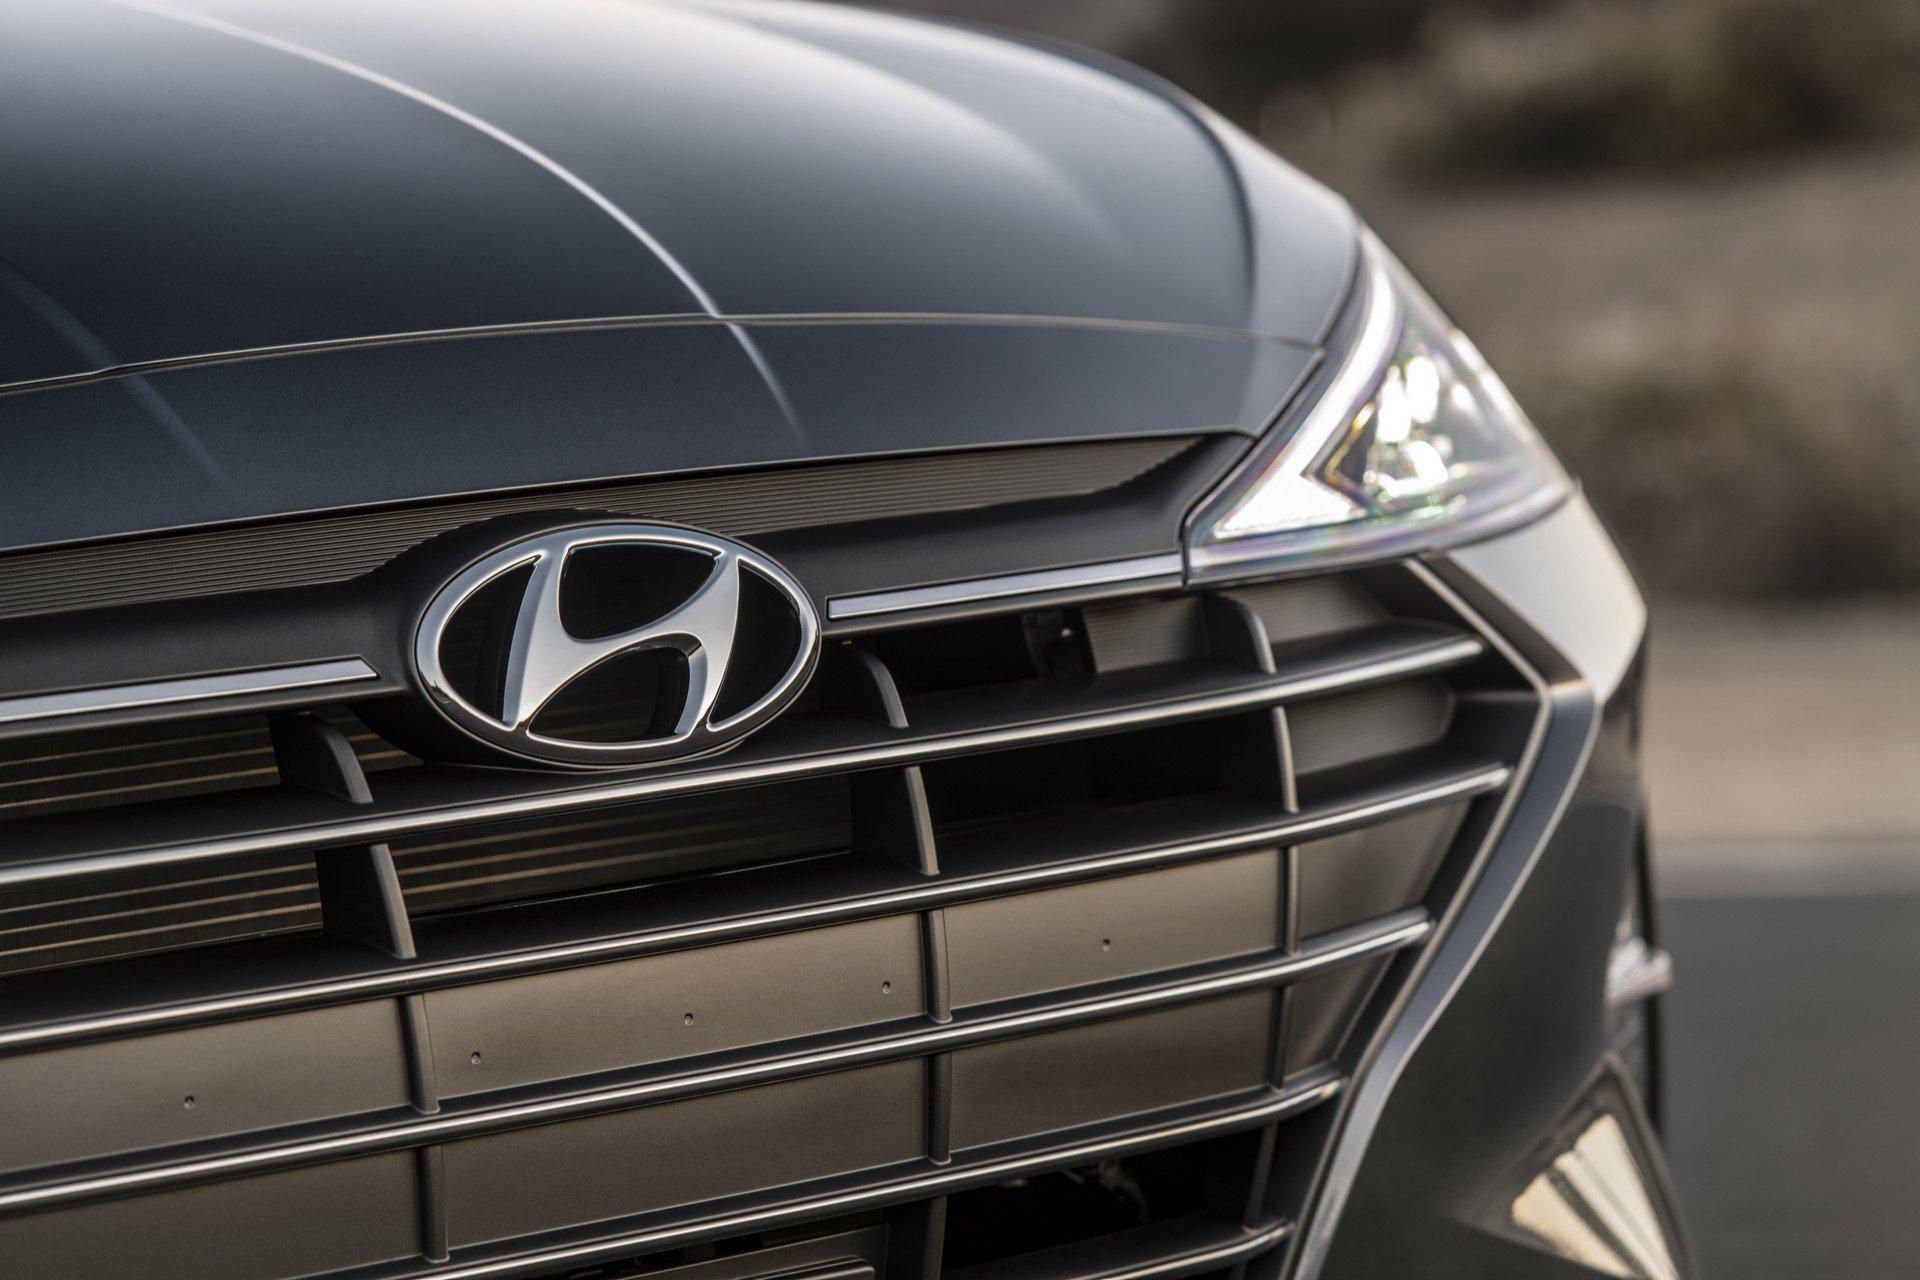 Hyundai Elantra 2019 (9)